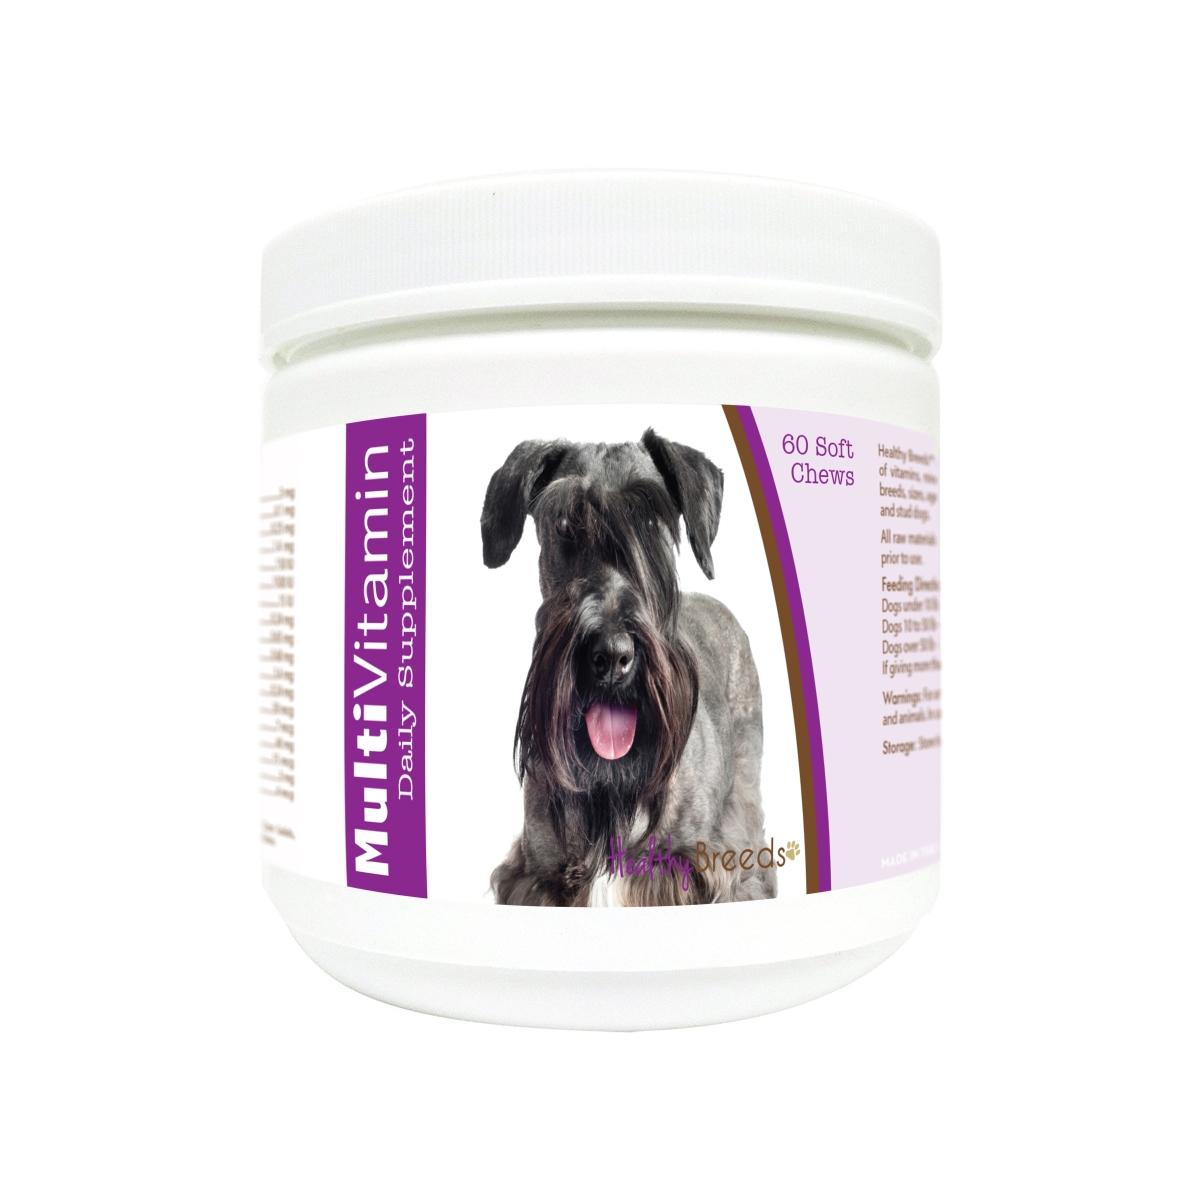 Healthy Breeds 840235180876 Cesky Terrier Multi-Vitamin Soft Chews - 60 Count